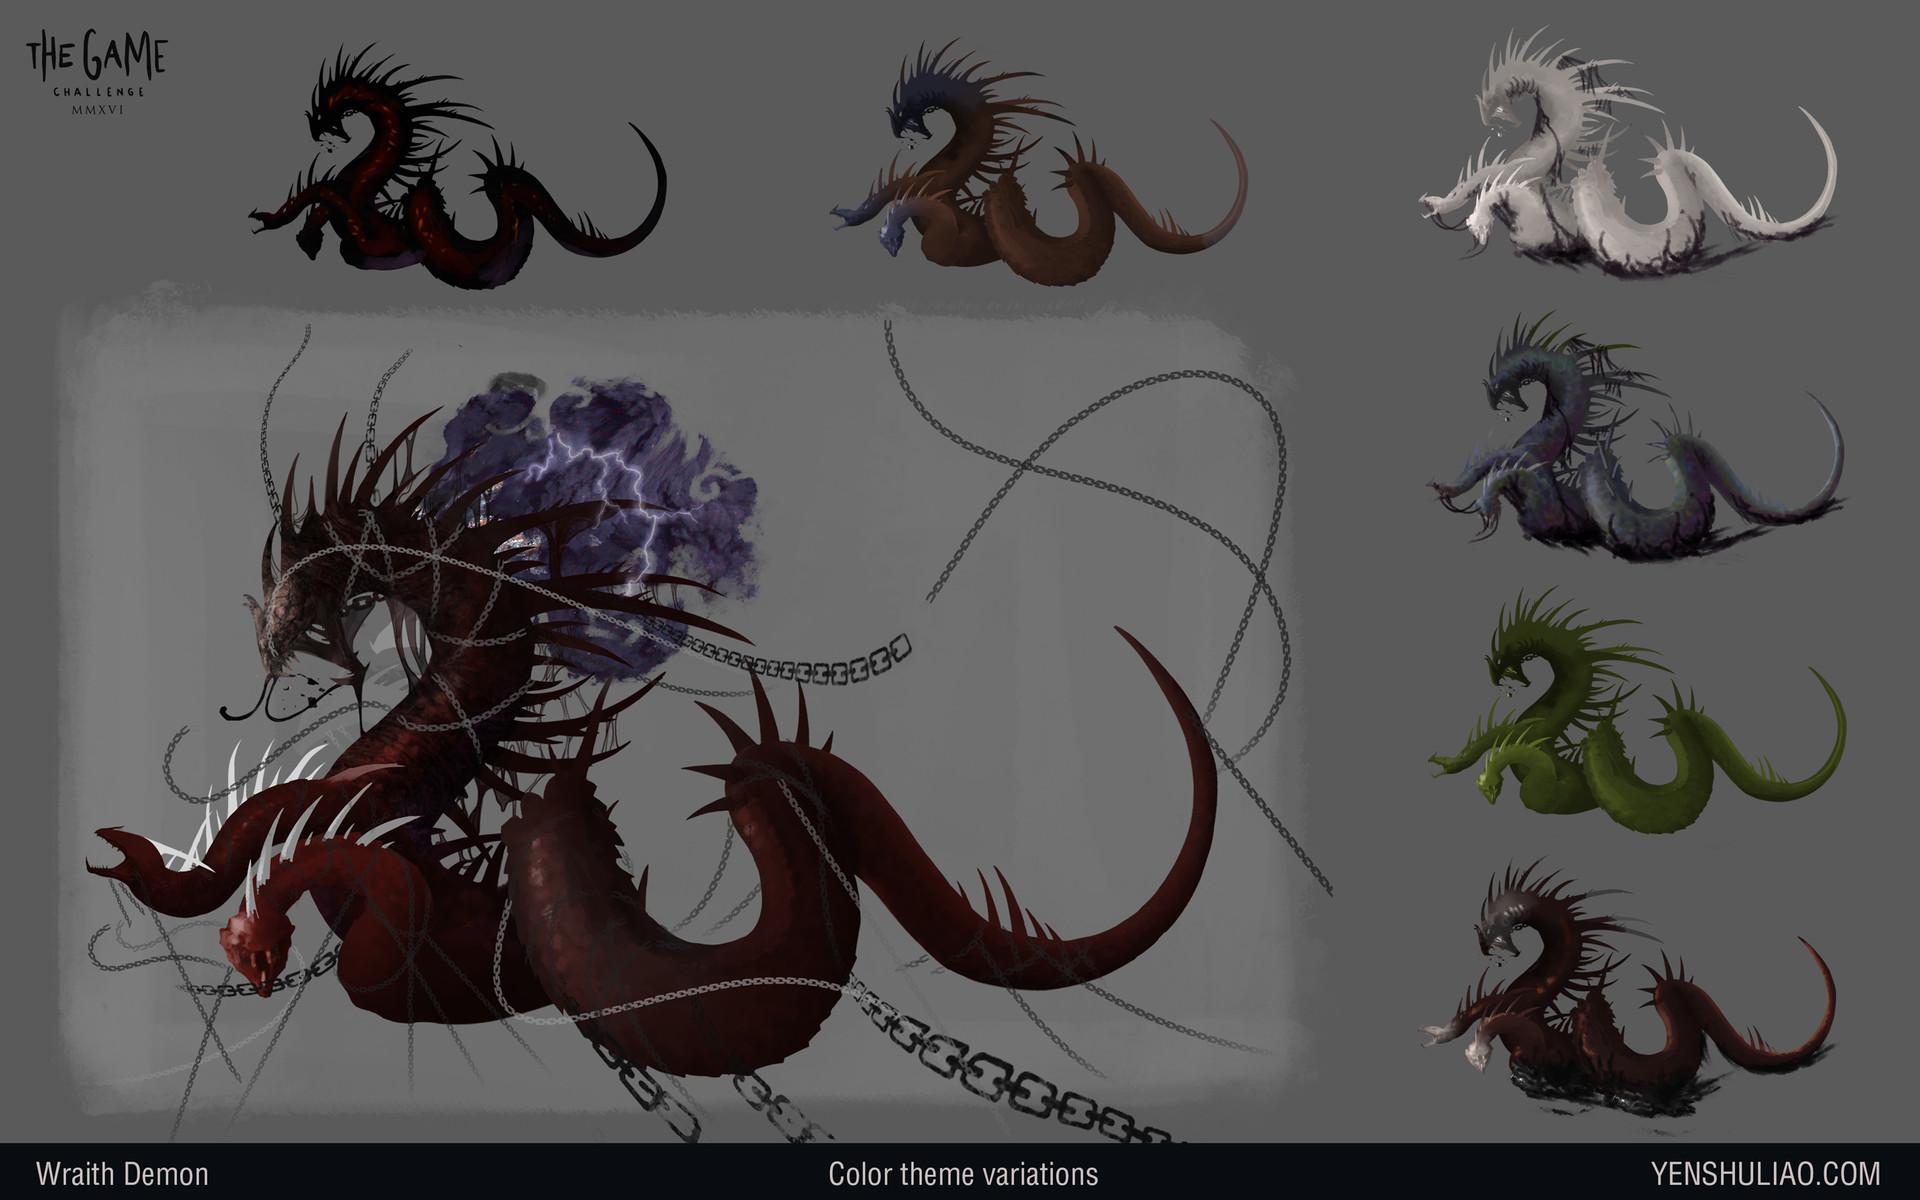 Yen shu liao demon dragon creature concept art03